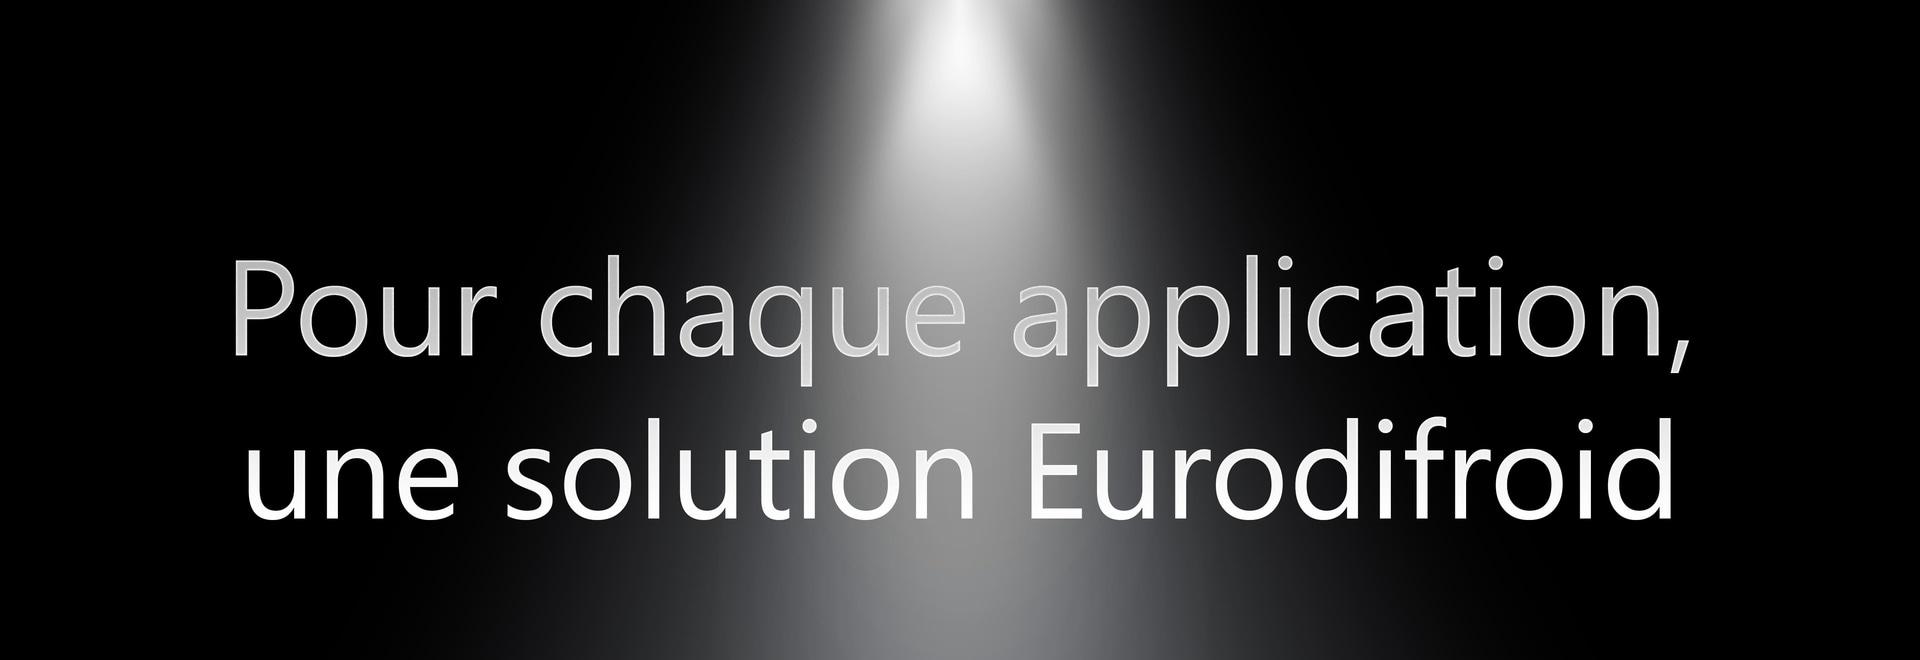 Discover the Eurodifroid catalogs!